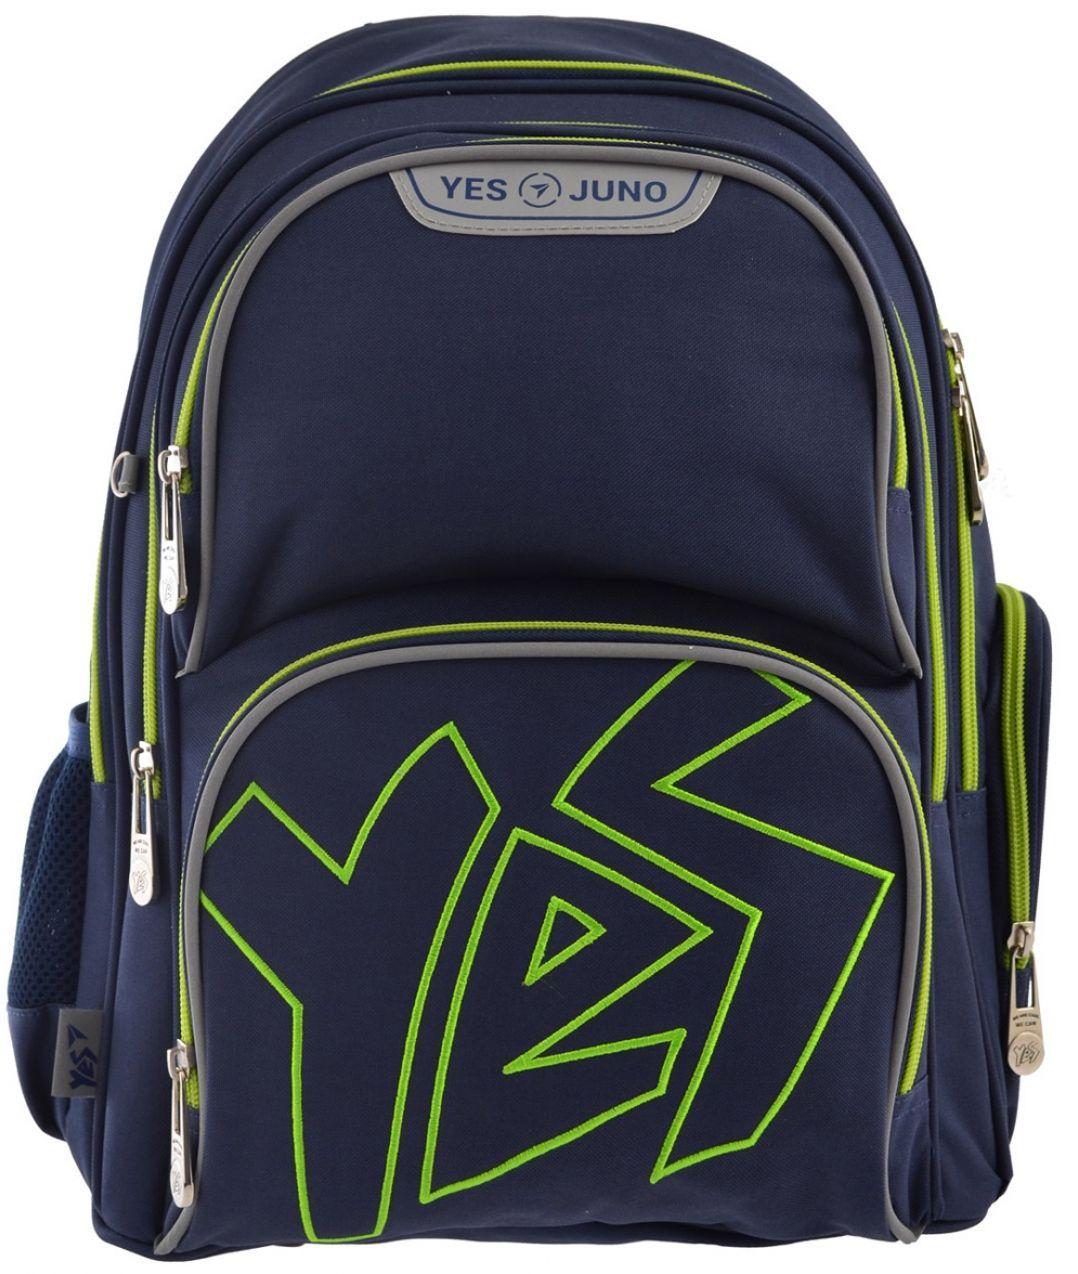 Школьный рюкзак YES S-30 Juno YES green 557366 темно-синий 15 л